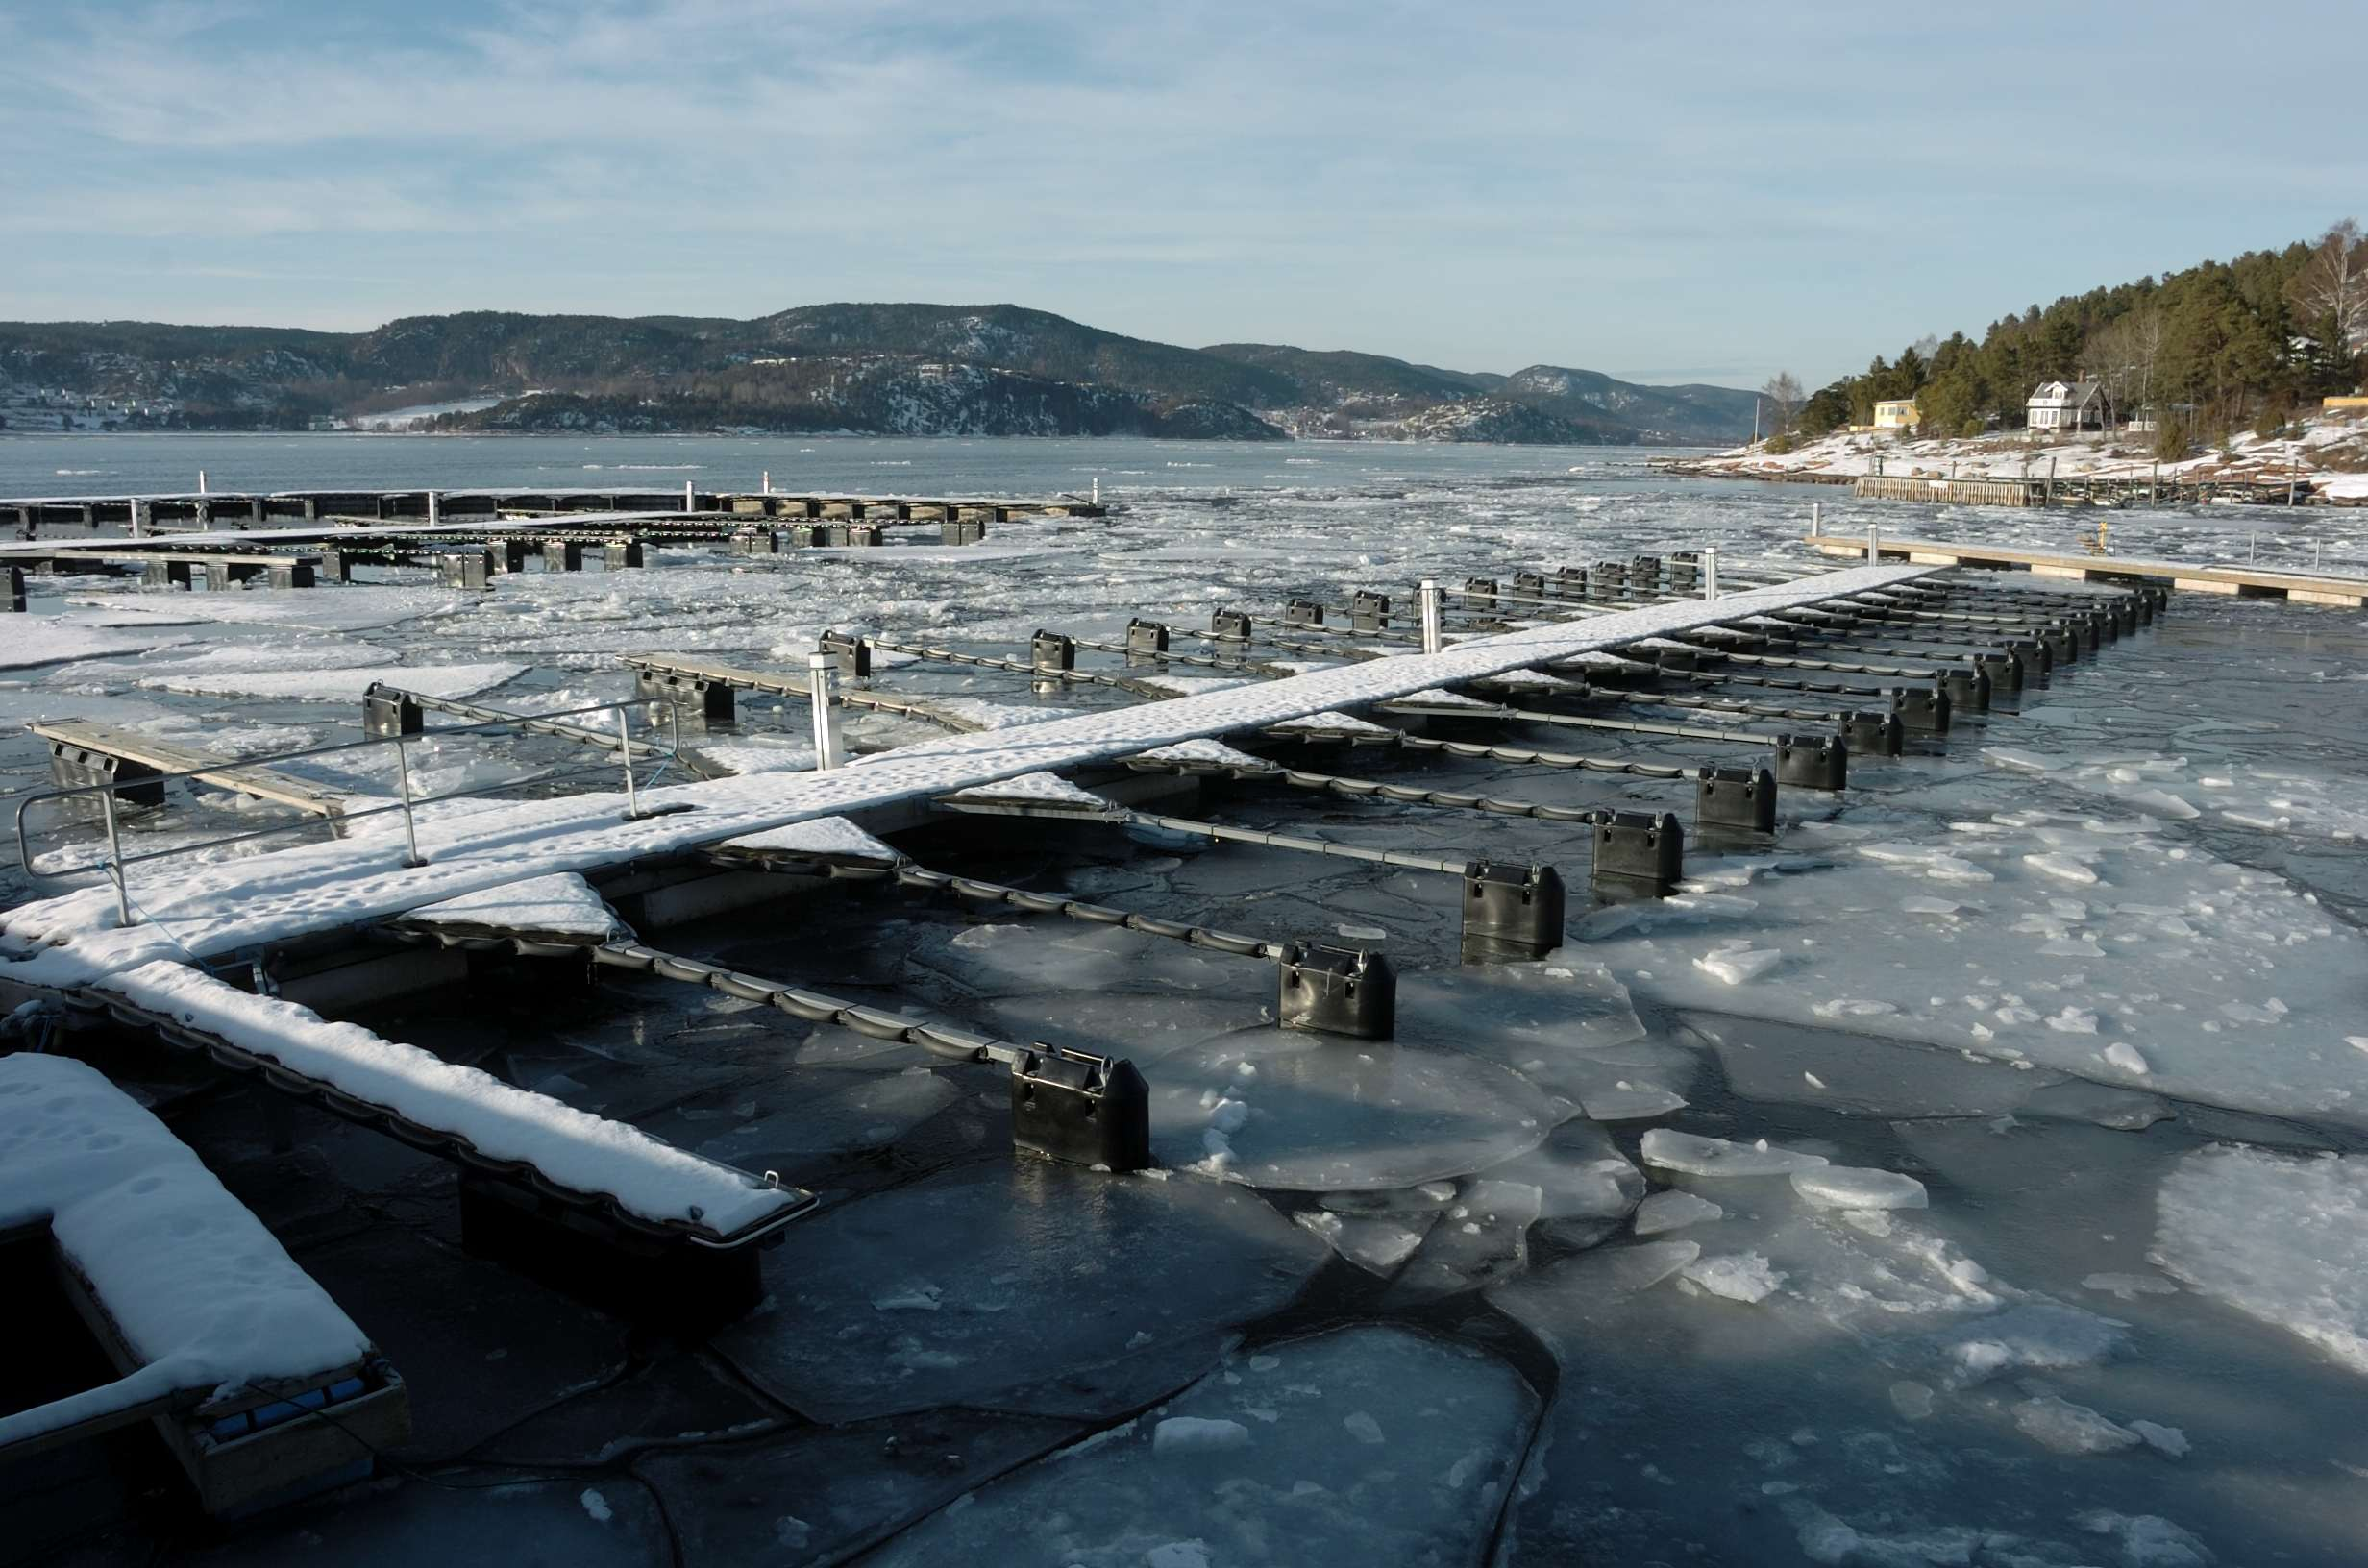 Rdtangen marina vinter 03 - LAV